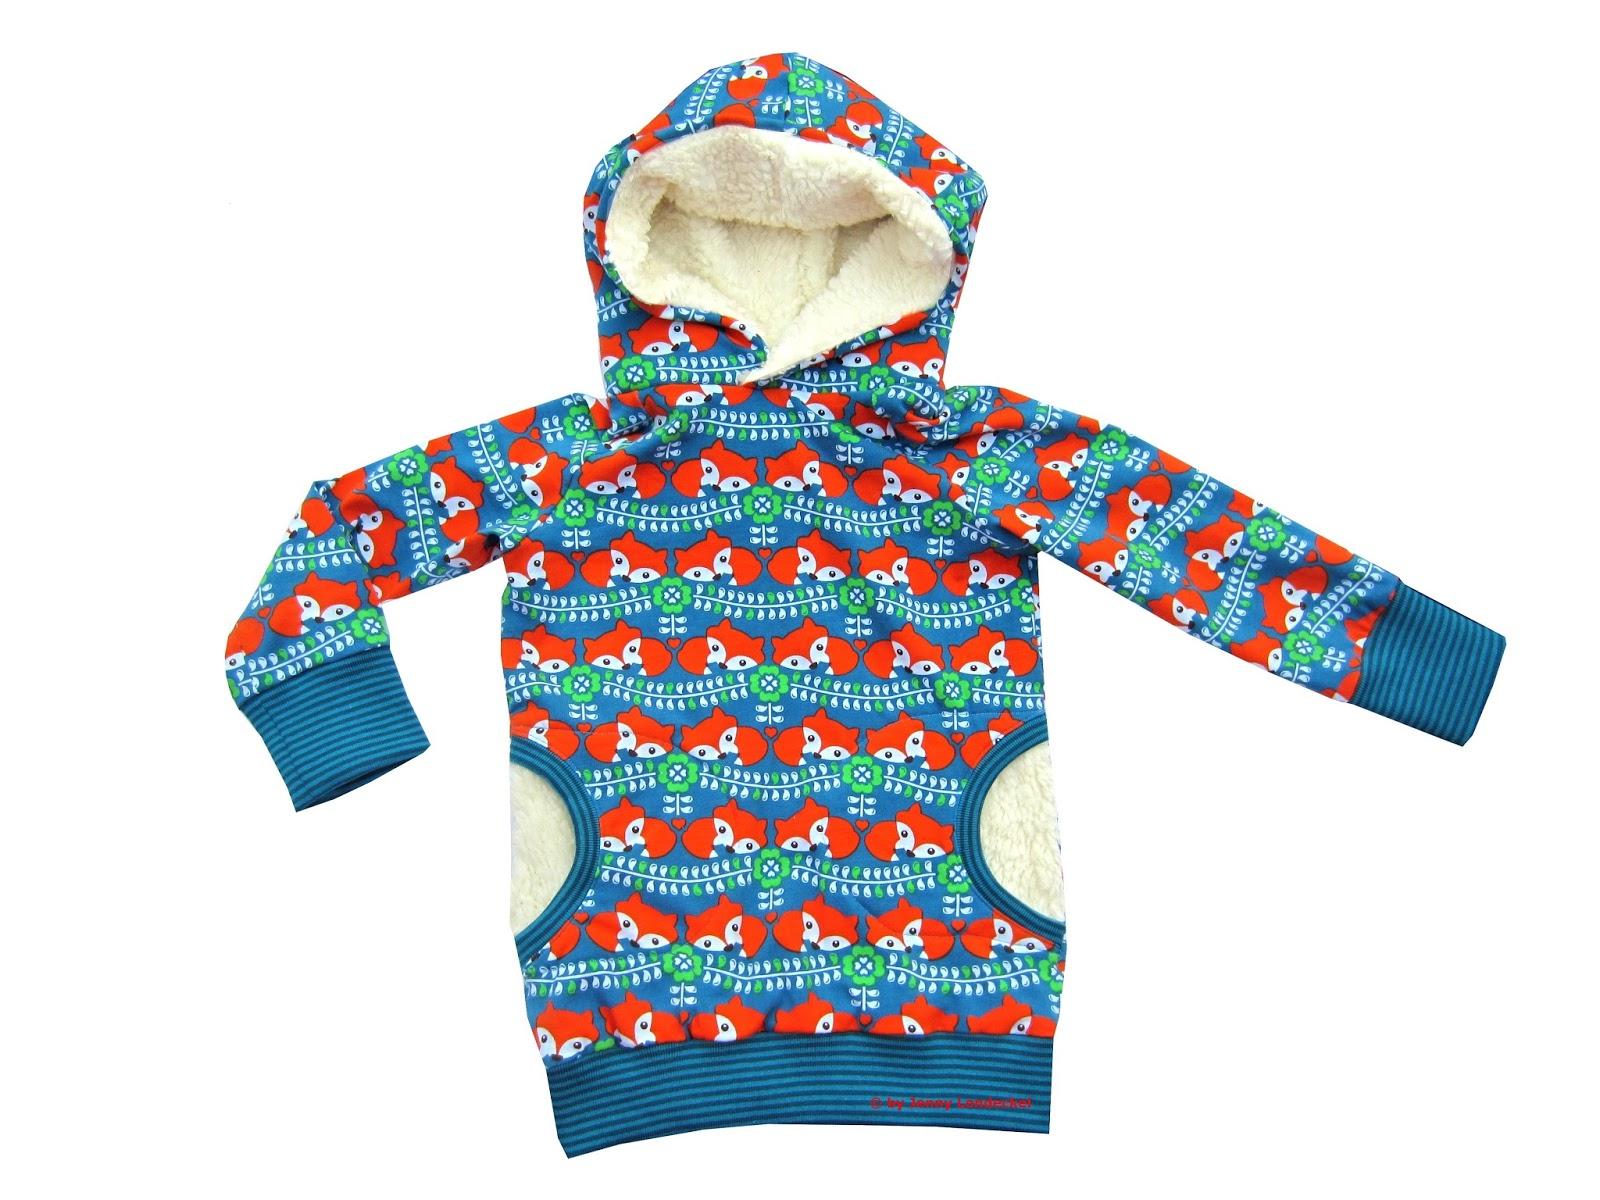 trash monstarz n hshop schnittmuster f r einen baby hoodie baby kapuzenpullover zum selber n hen. Black Bedroom Furniture Sets. Home Design Ideas